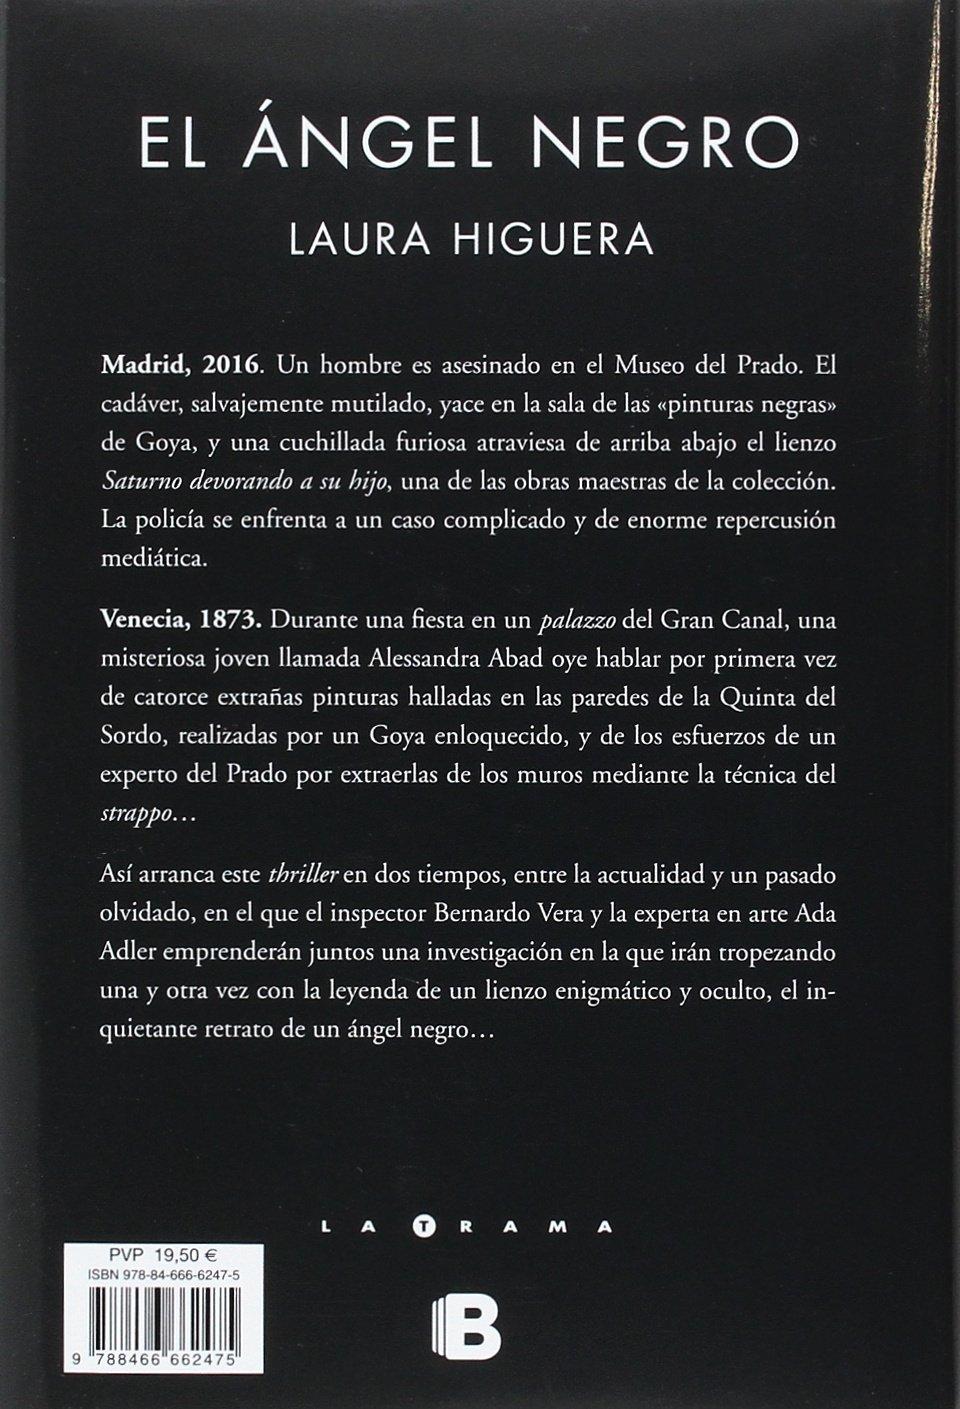 Amazon.com: El ángel negro / Black Angel (Spanish Edition) (9788466662475): Laura Higuera: Books